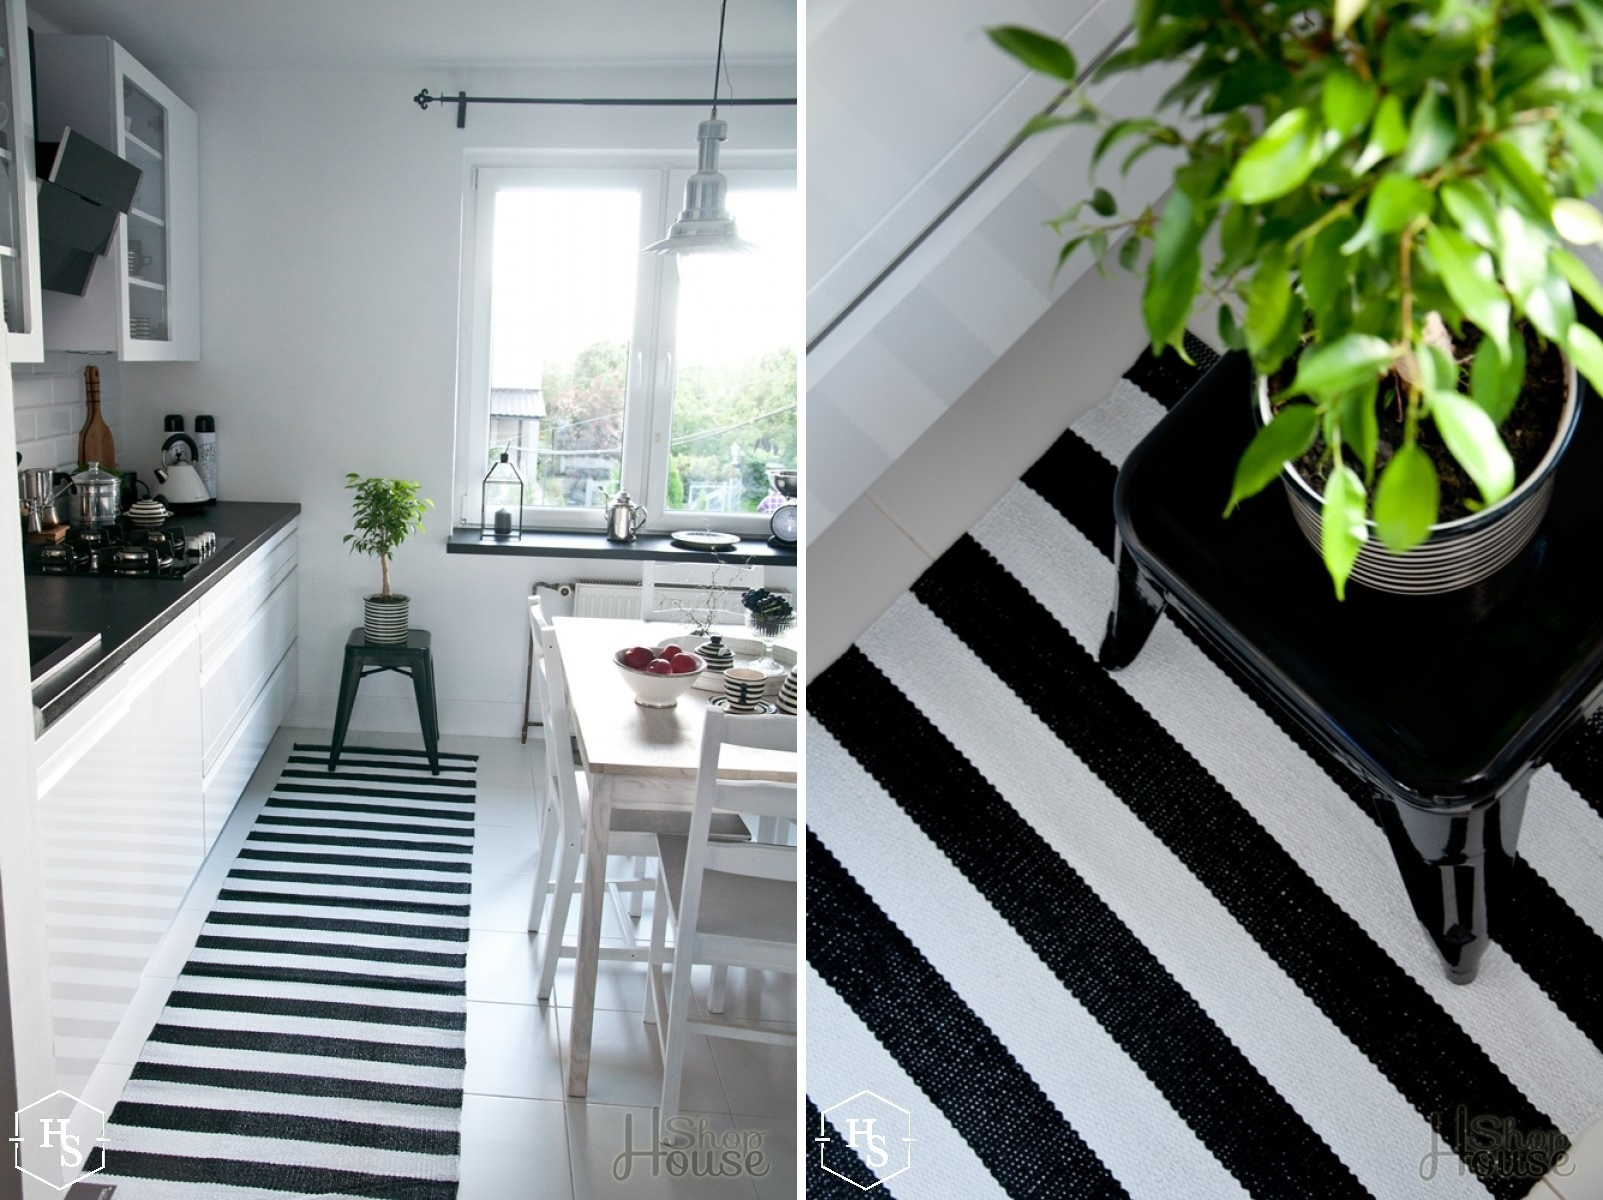 Dywan:  houseshop.pl